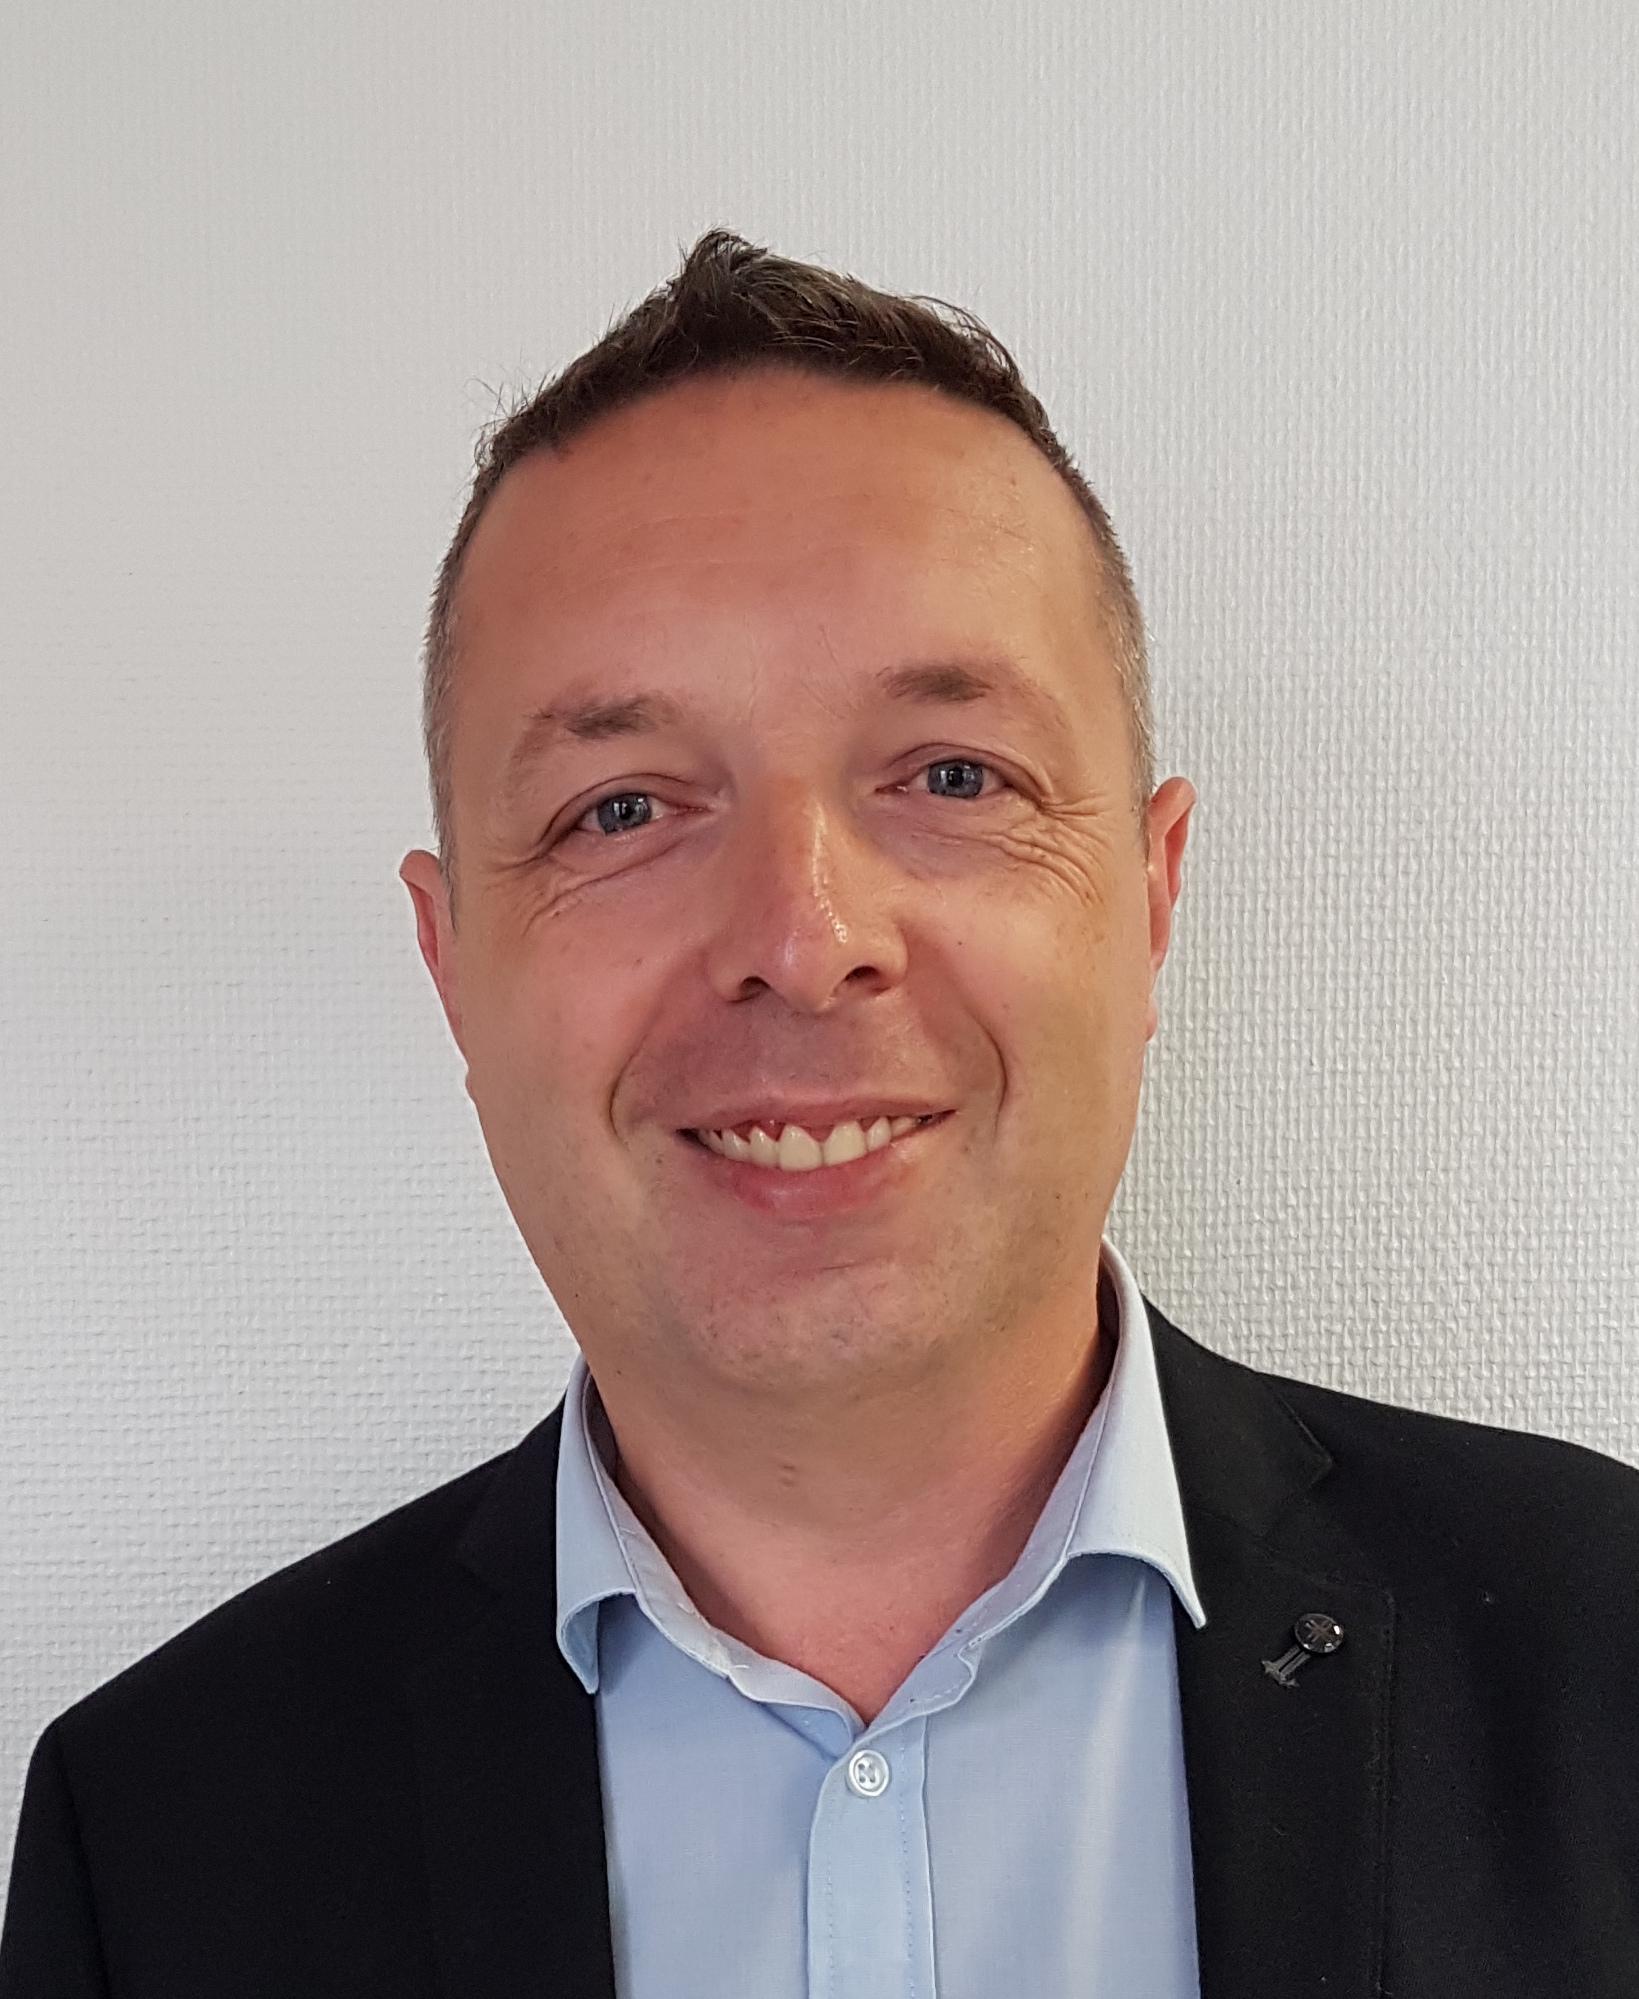 Jérôme VANDESAVEL